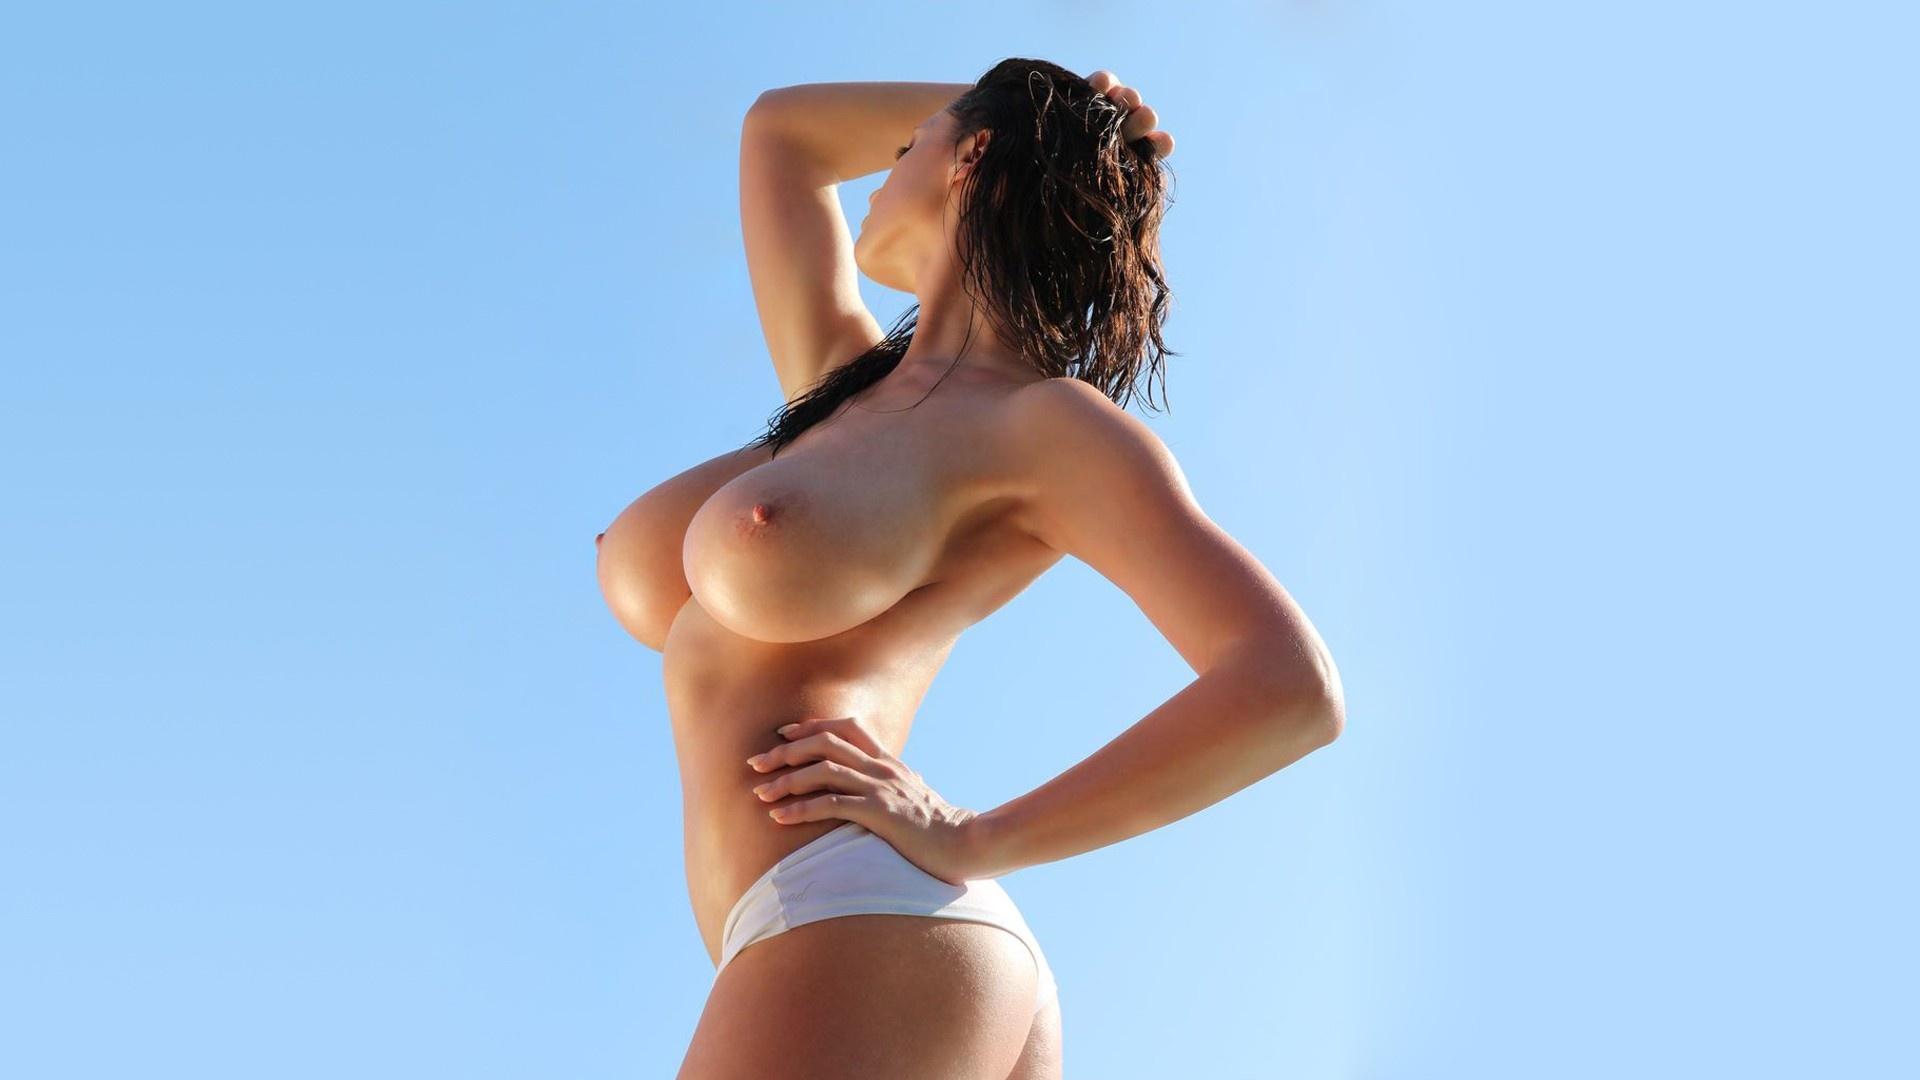 ... Kendrick 1920x1080 sexy nude hd wallpaper Resolution Size: 1920x1080